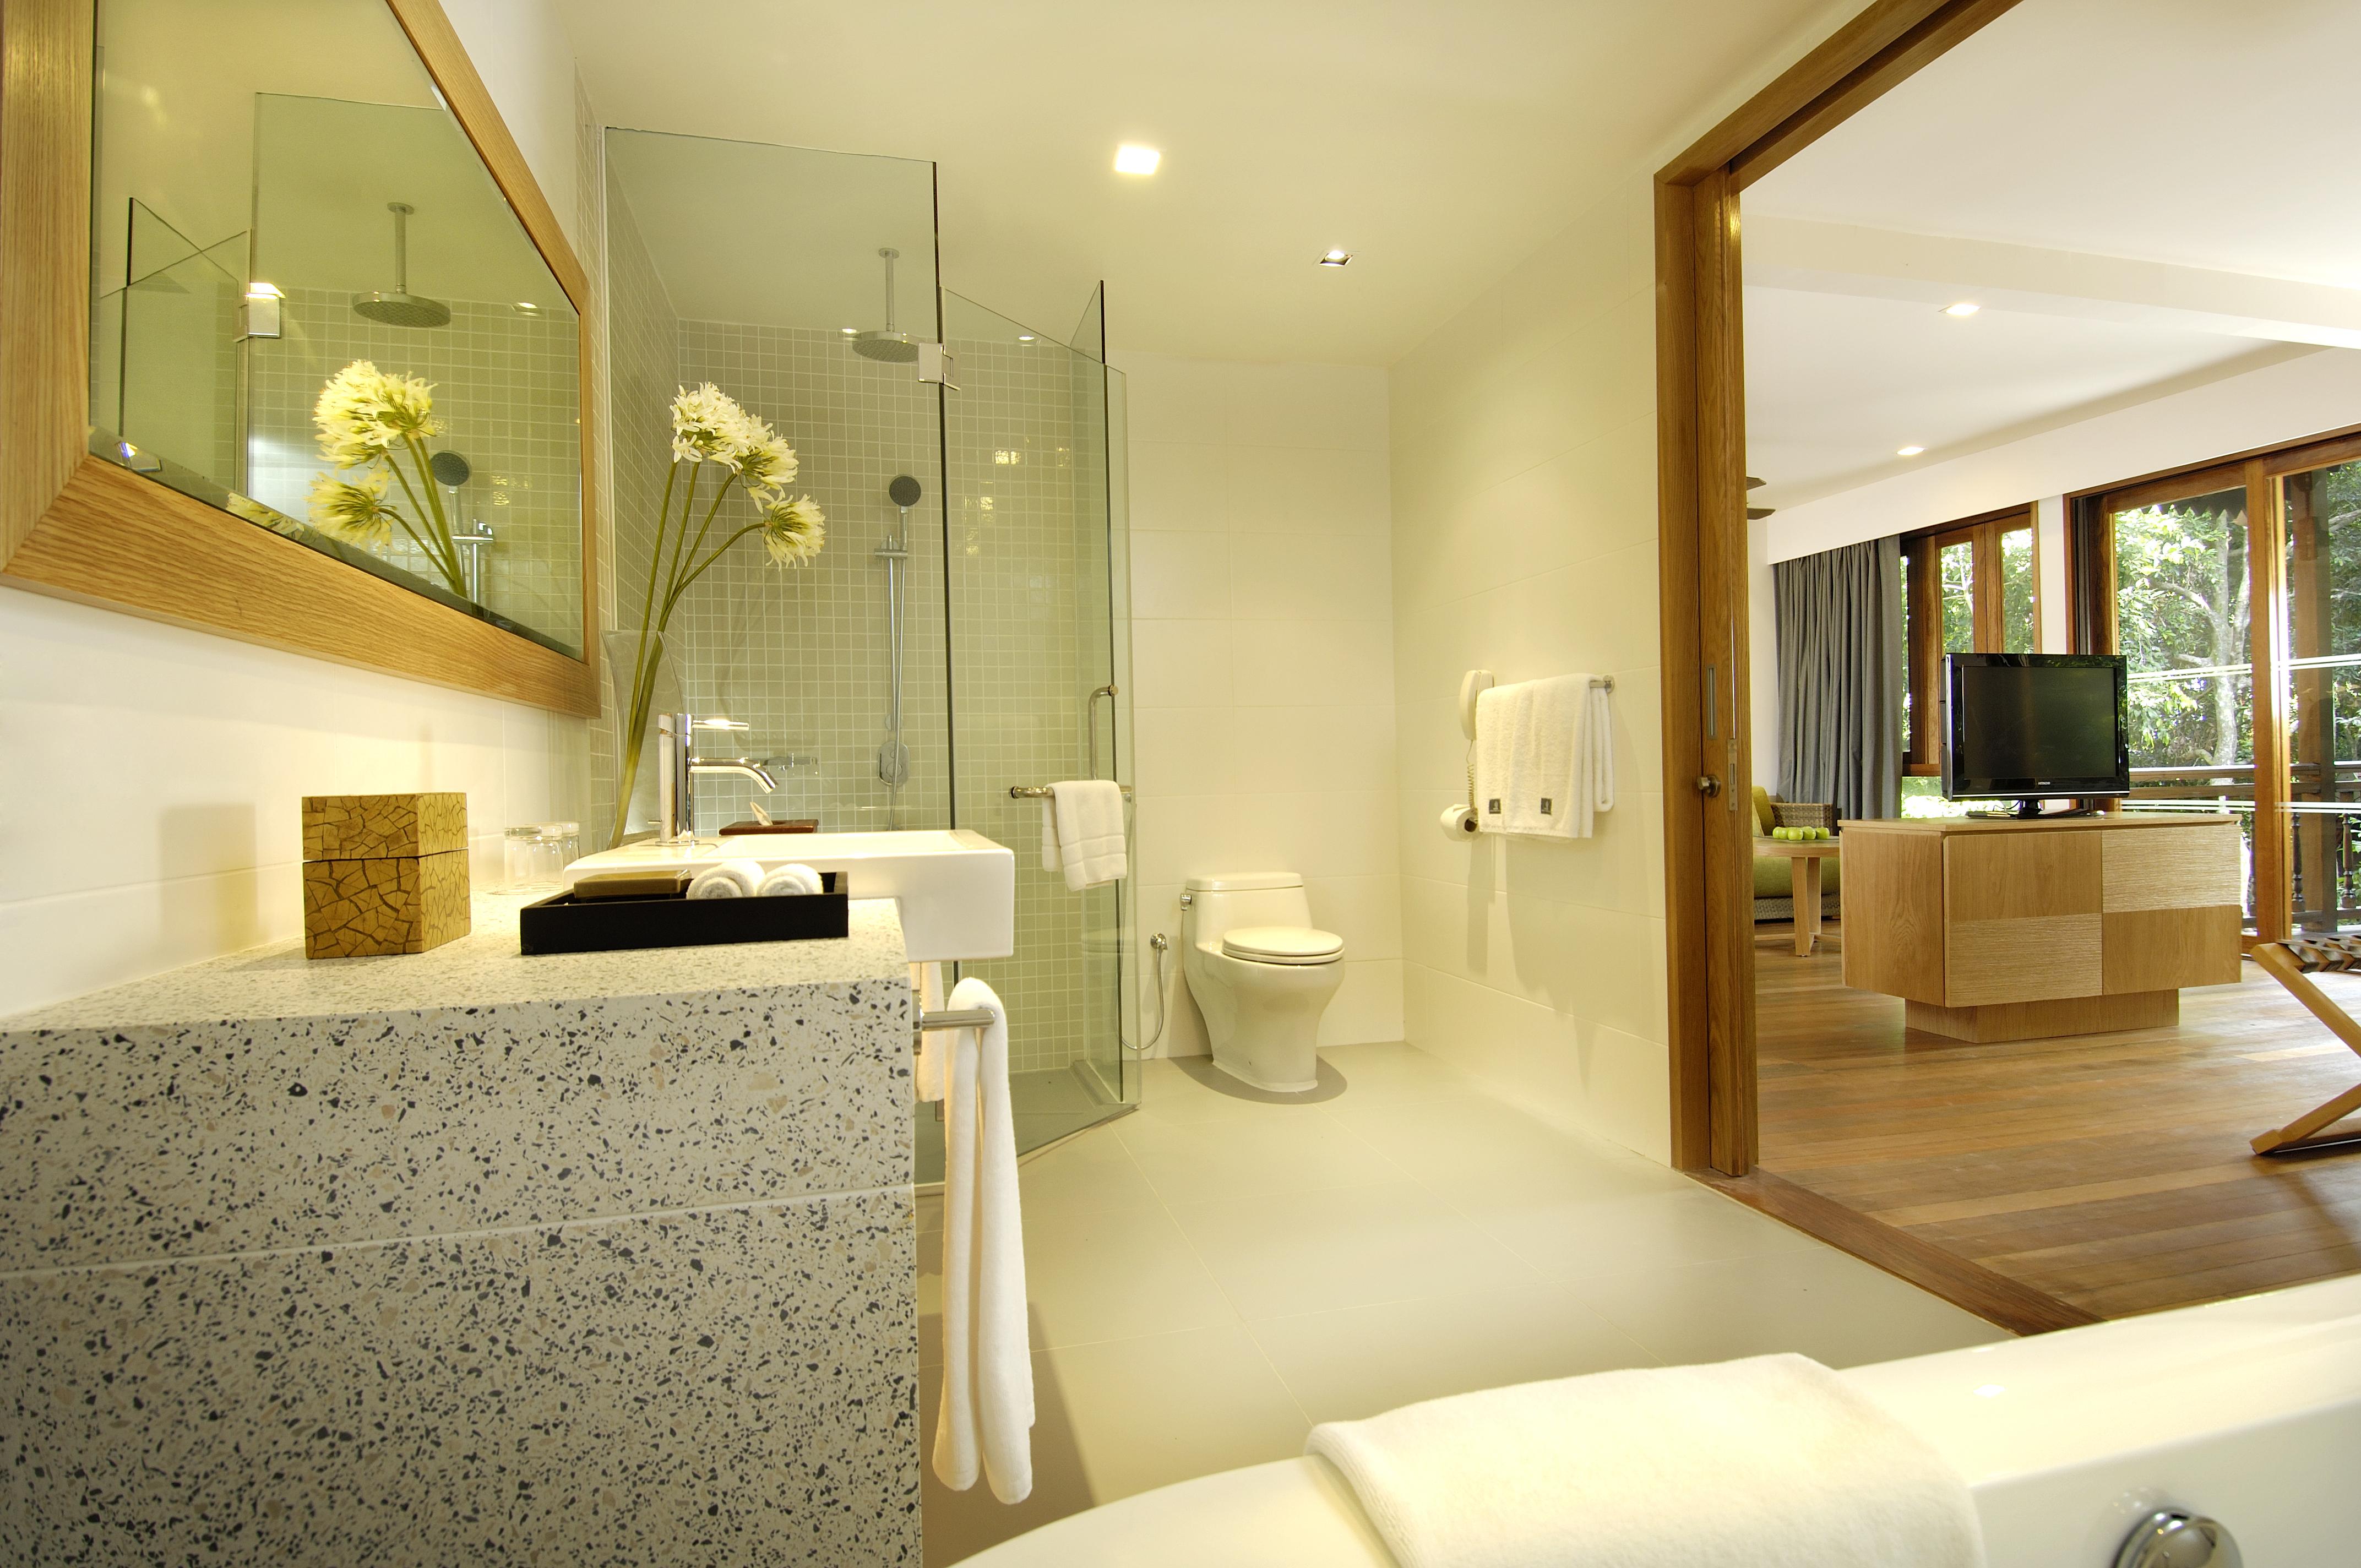 Berjaya-Langkawi-Resort-Rainforest Studio - Bathroom View